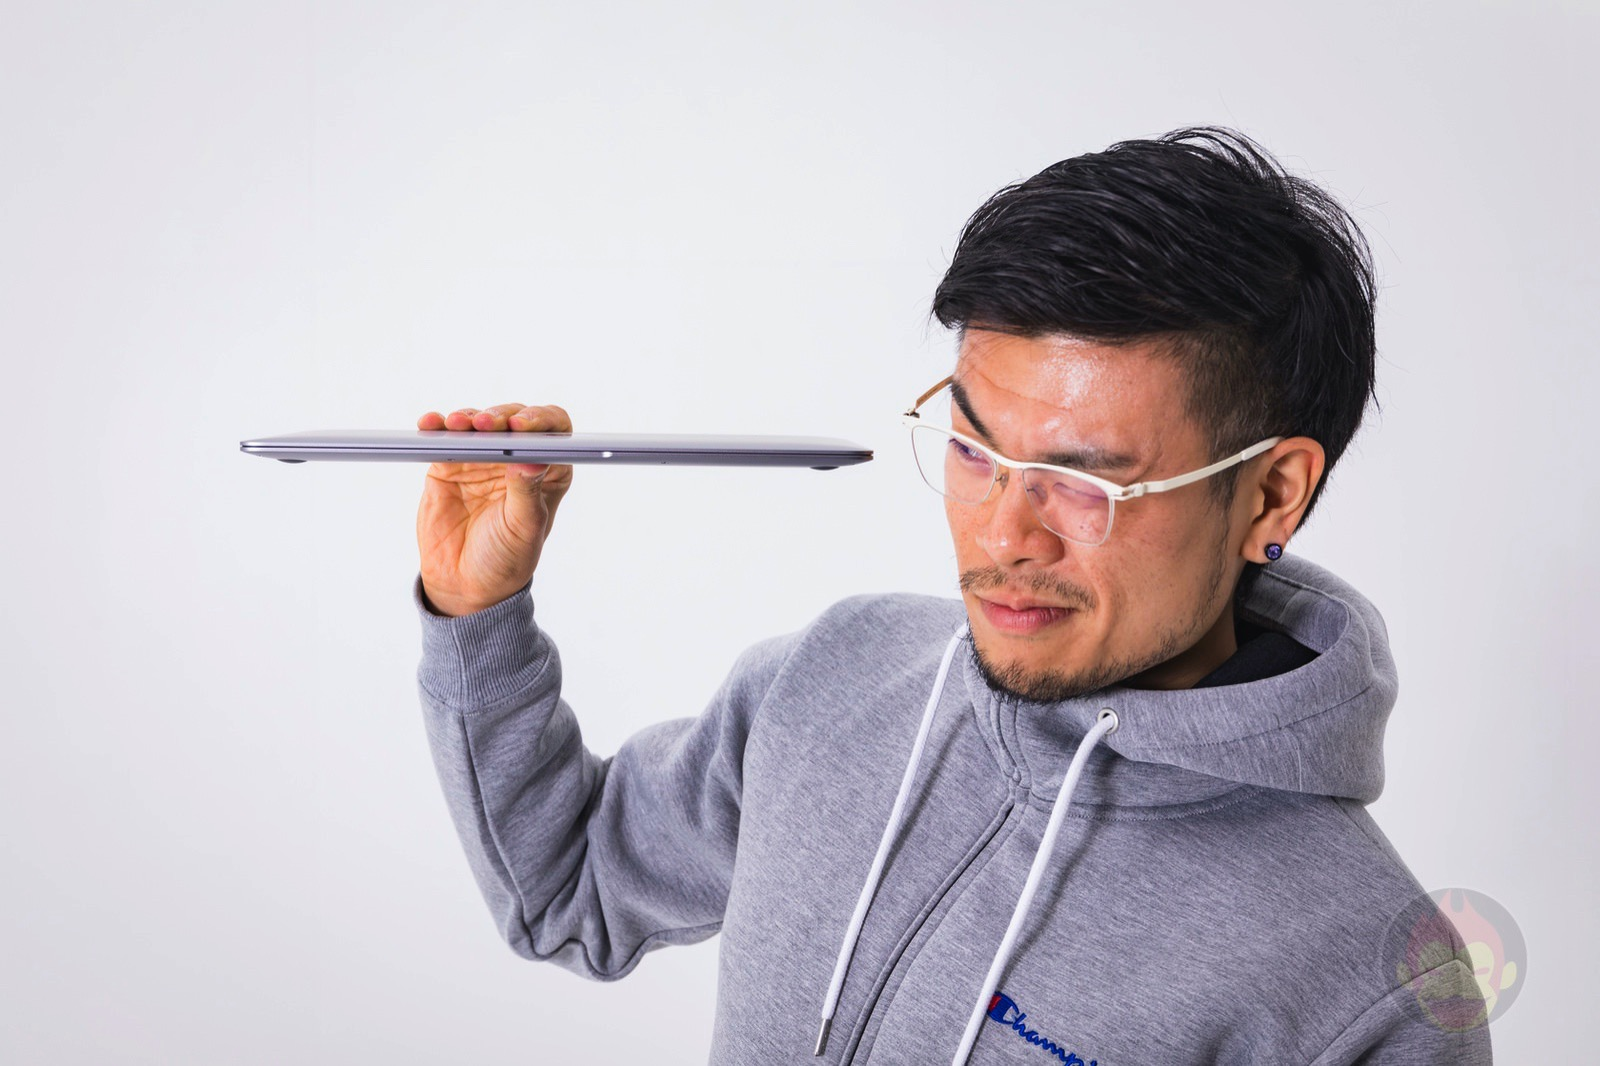 MacBook-Air-2018-Review-02.jpg